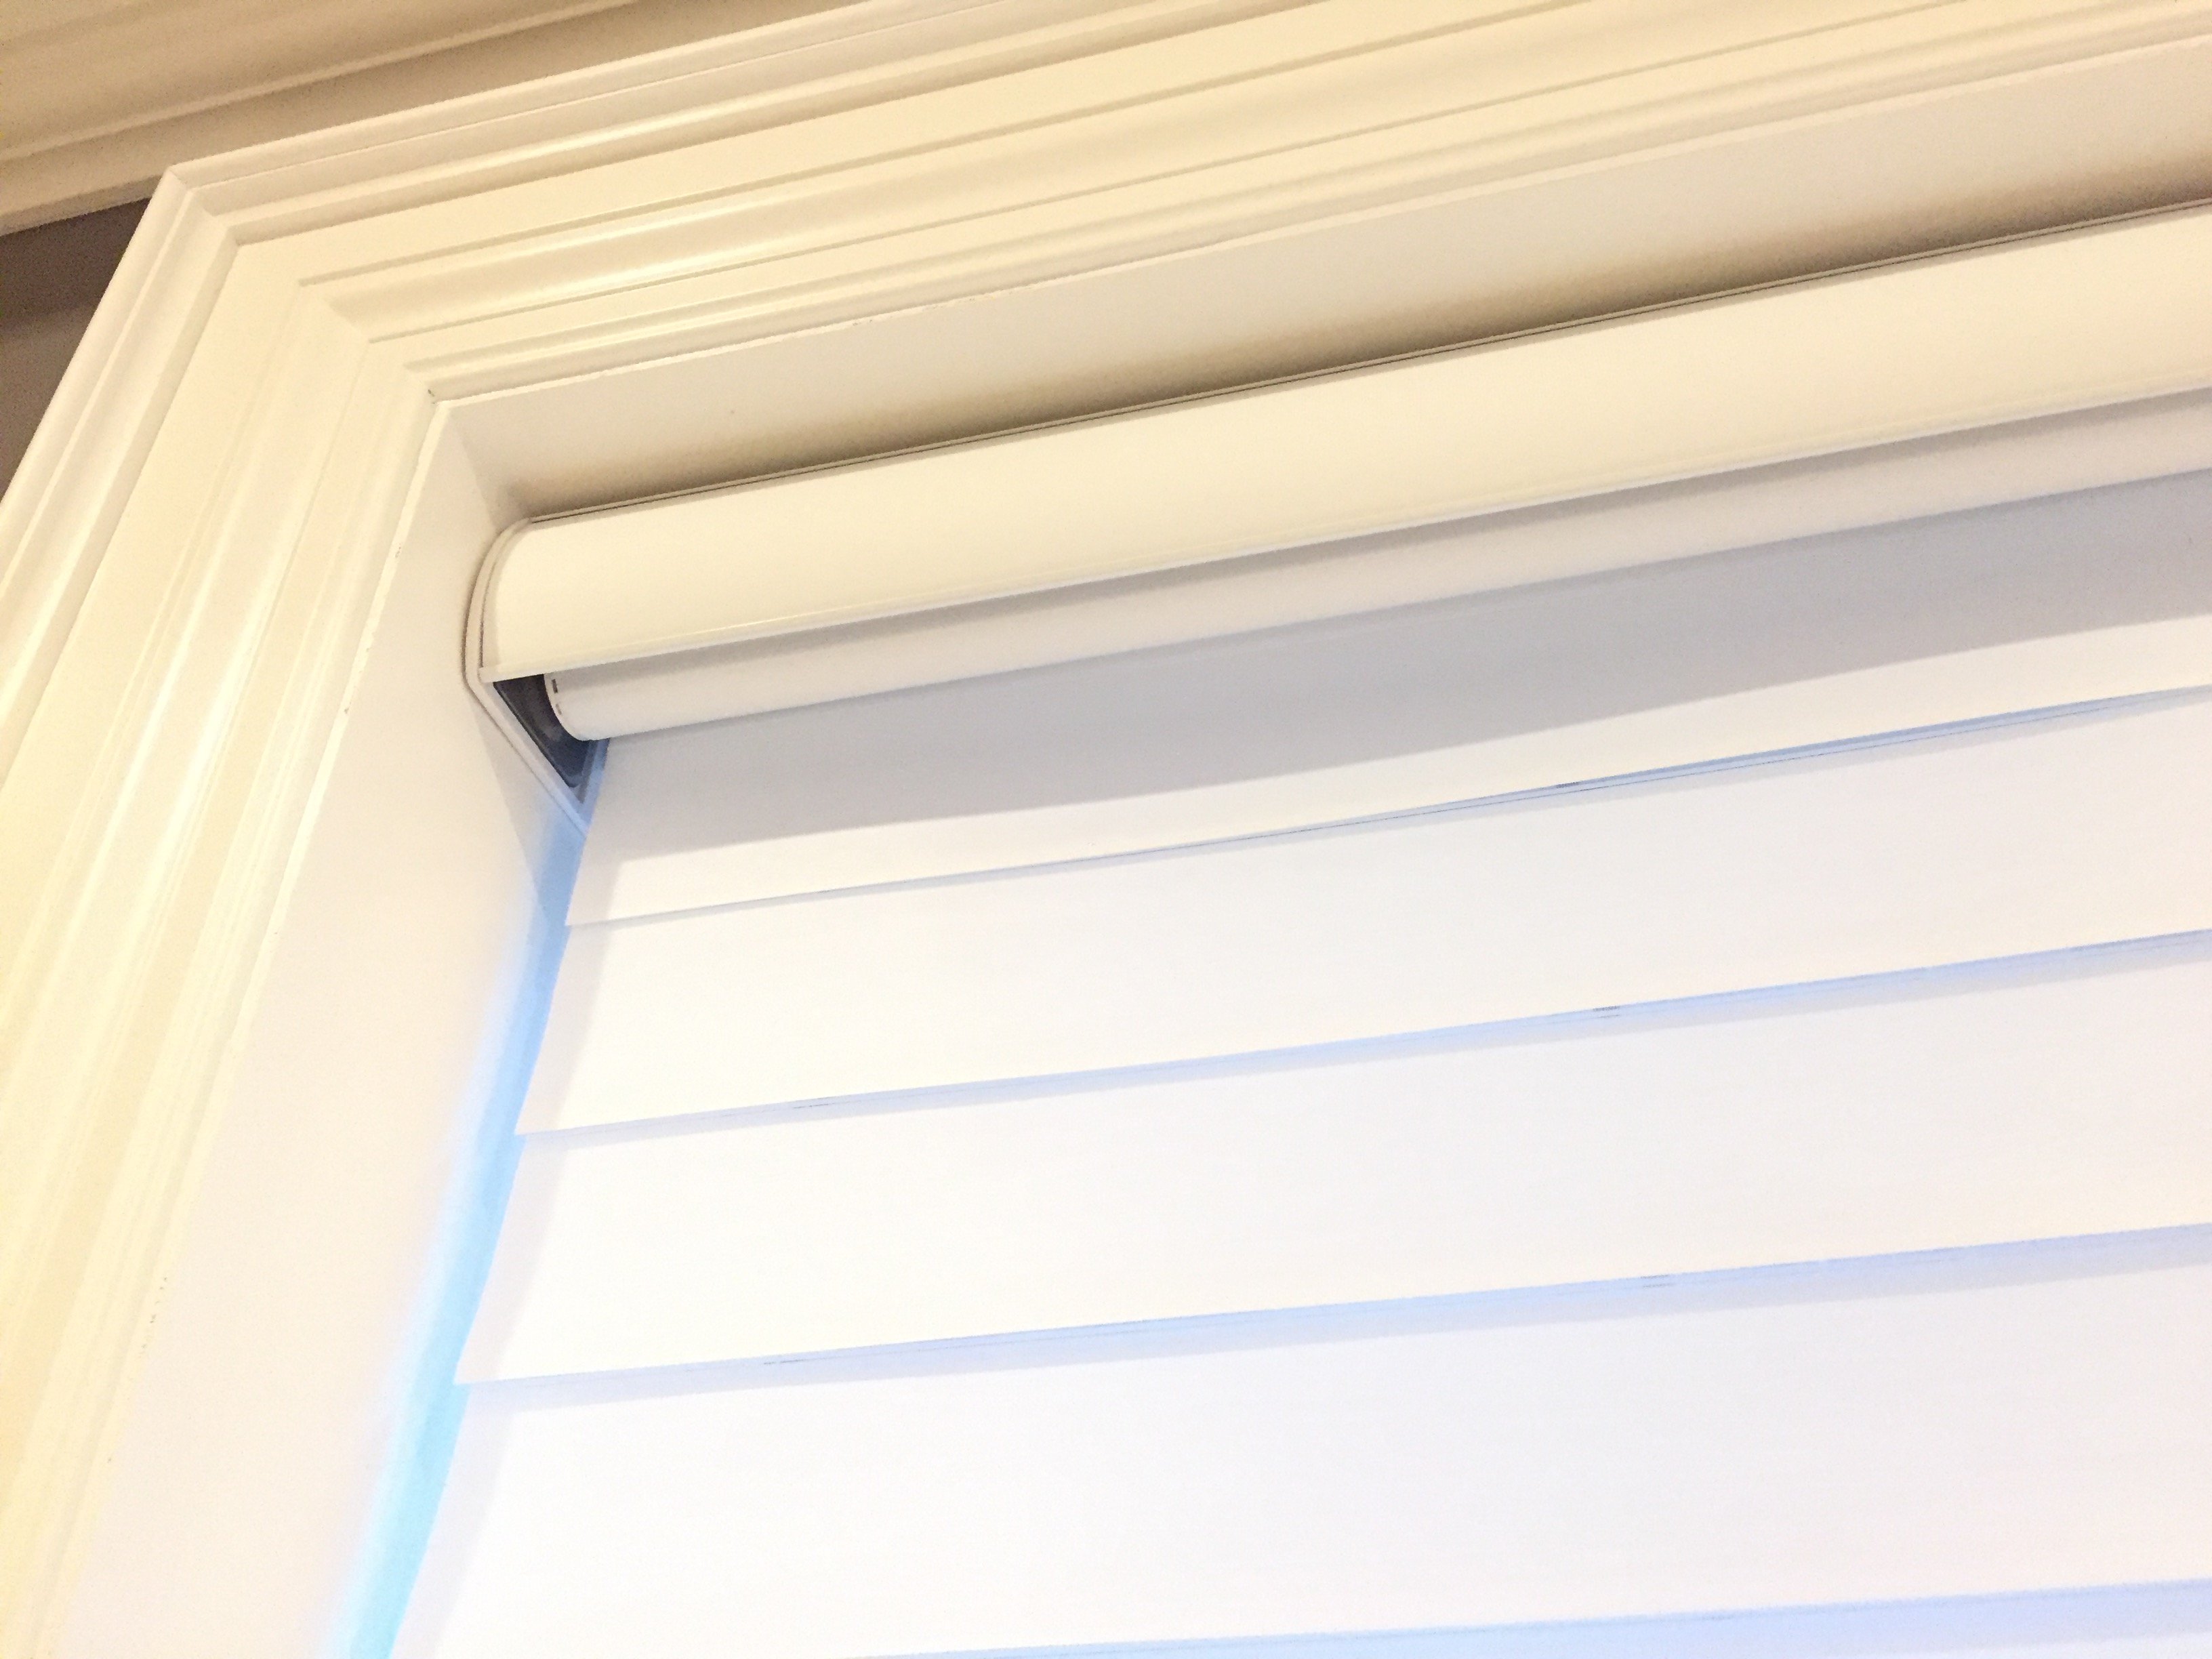 blinds interecosb duette blind portfolio silhouette